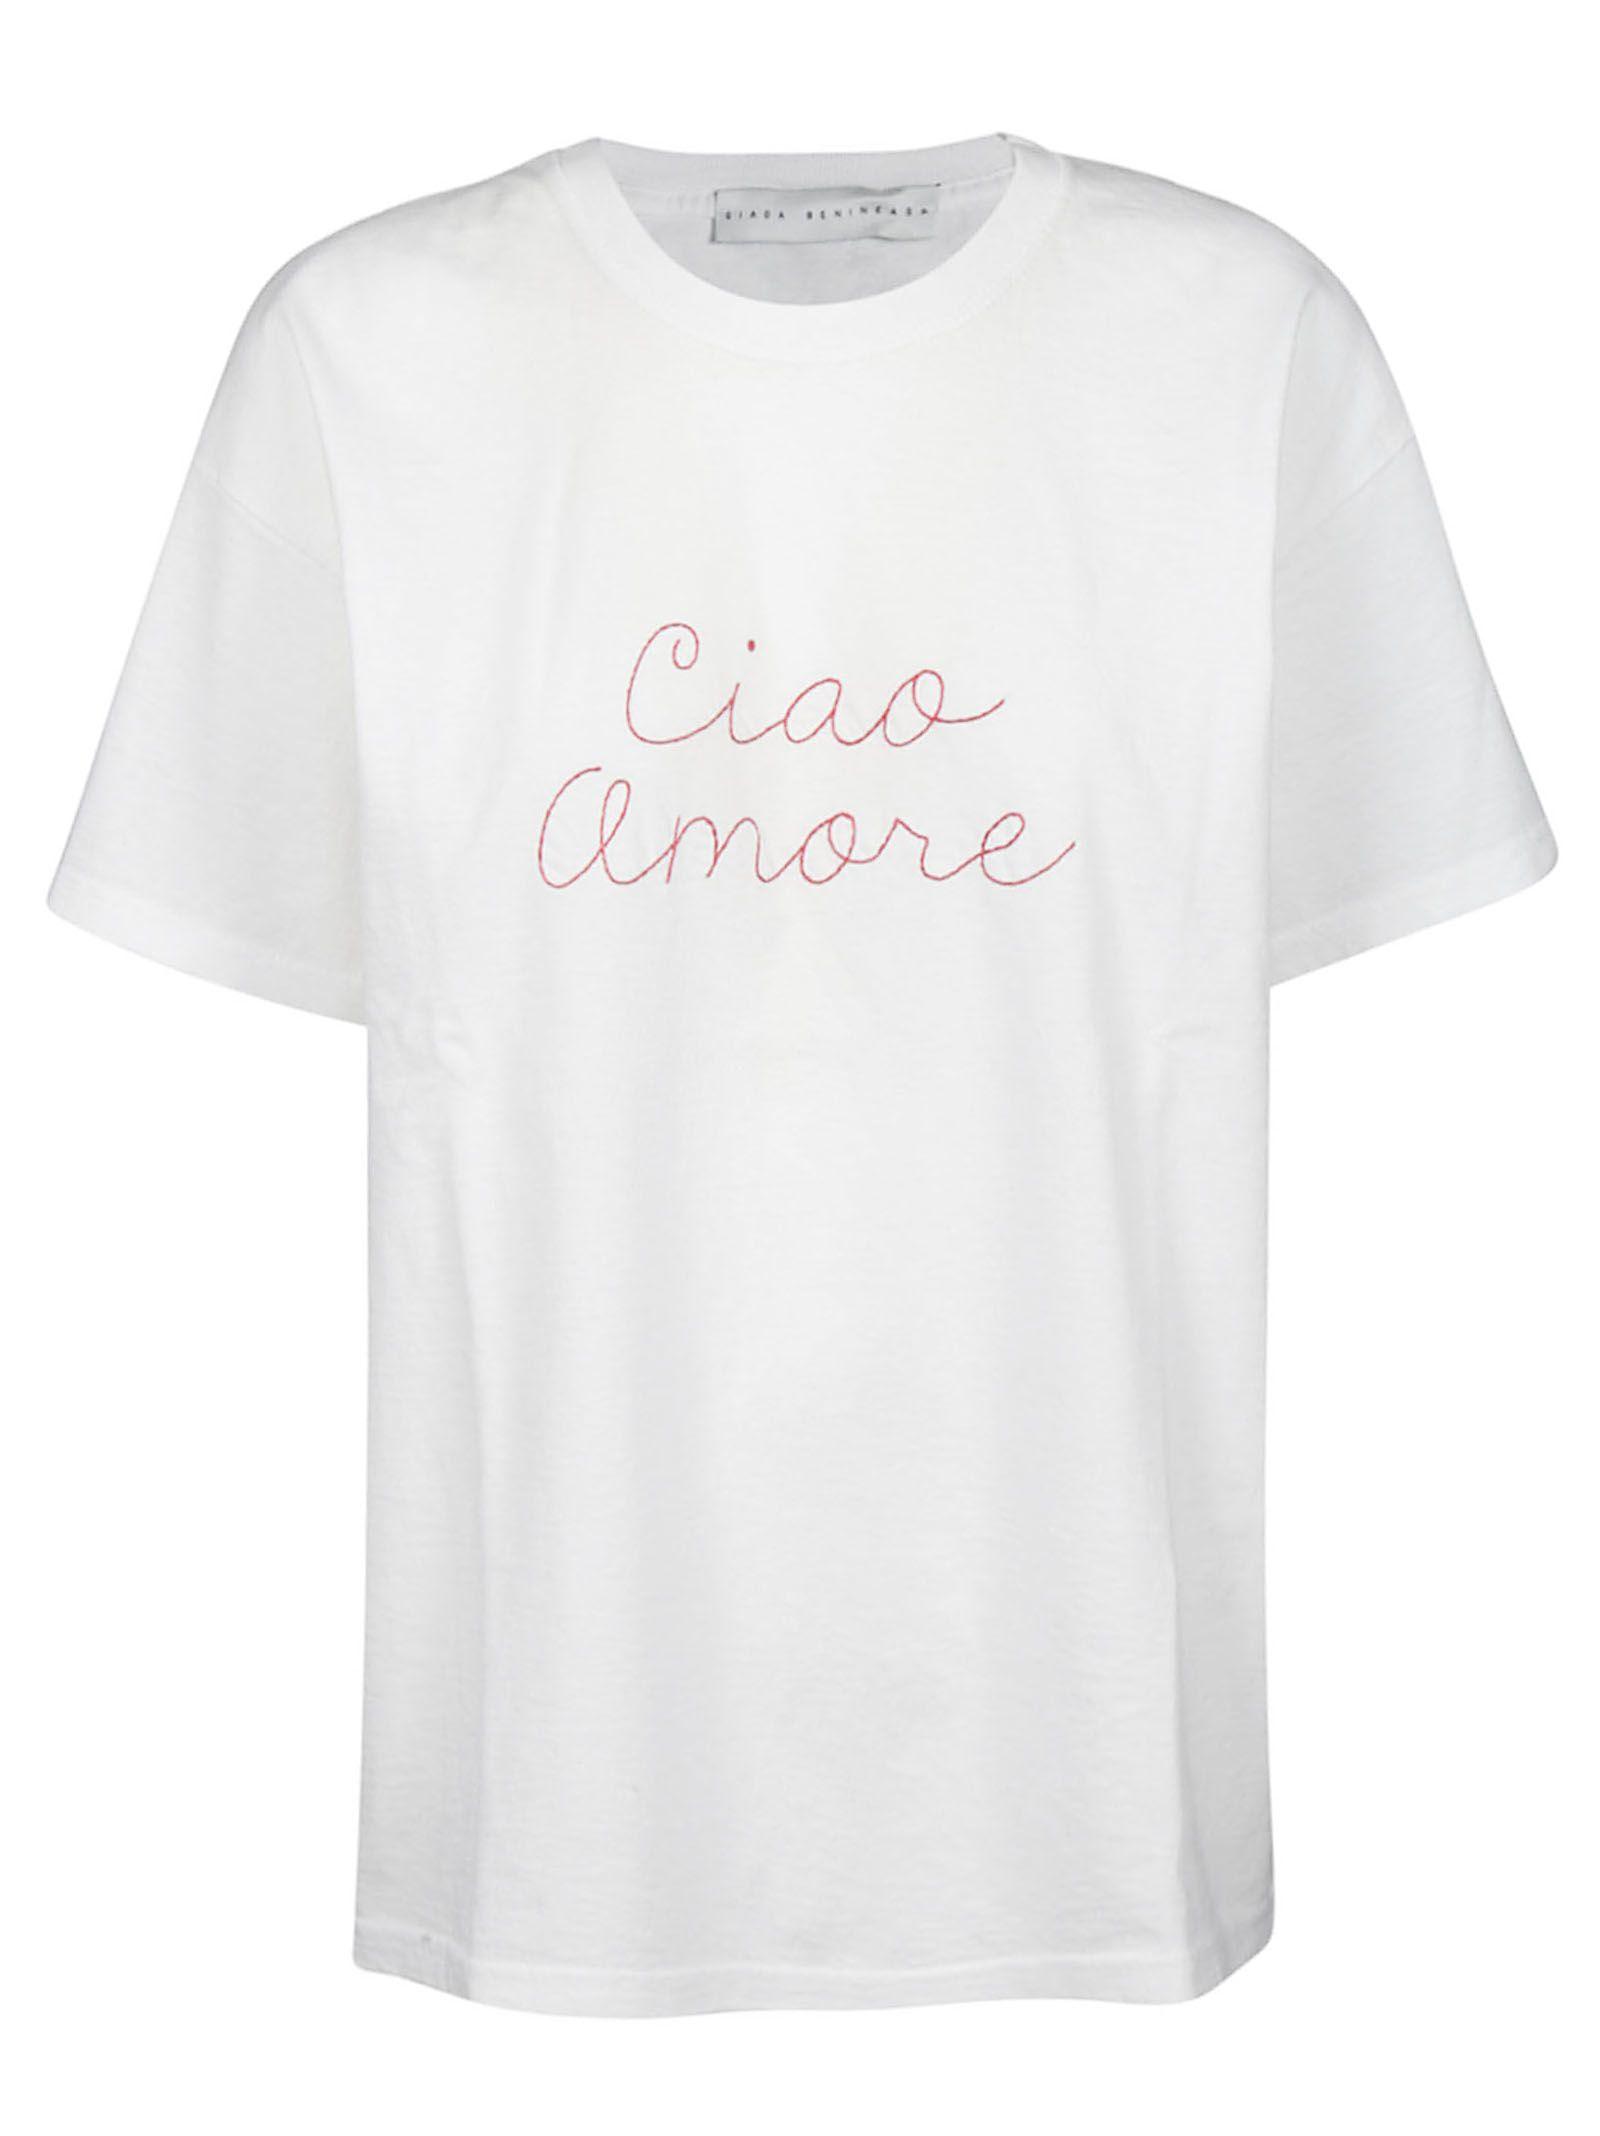 Giada Benincasa Giada Benincasa Ciao Amore T Shirt White